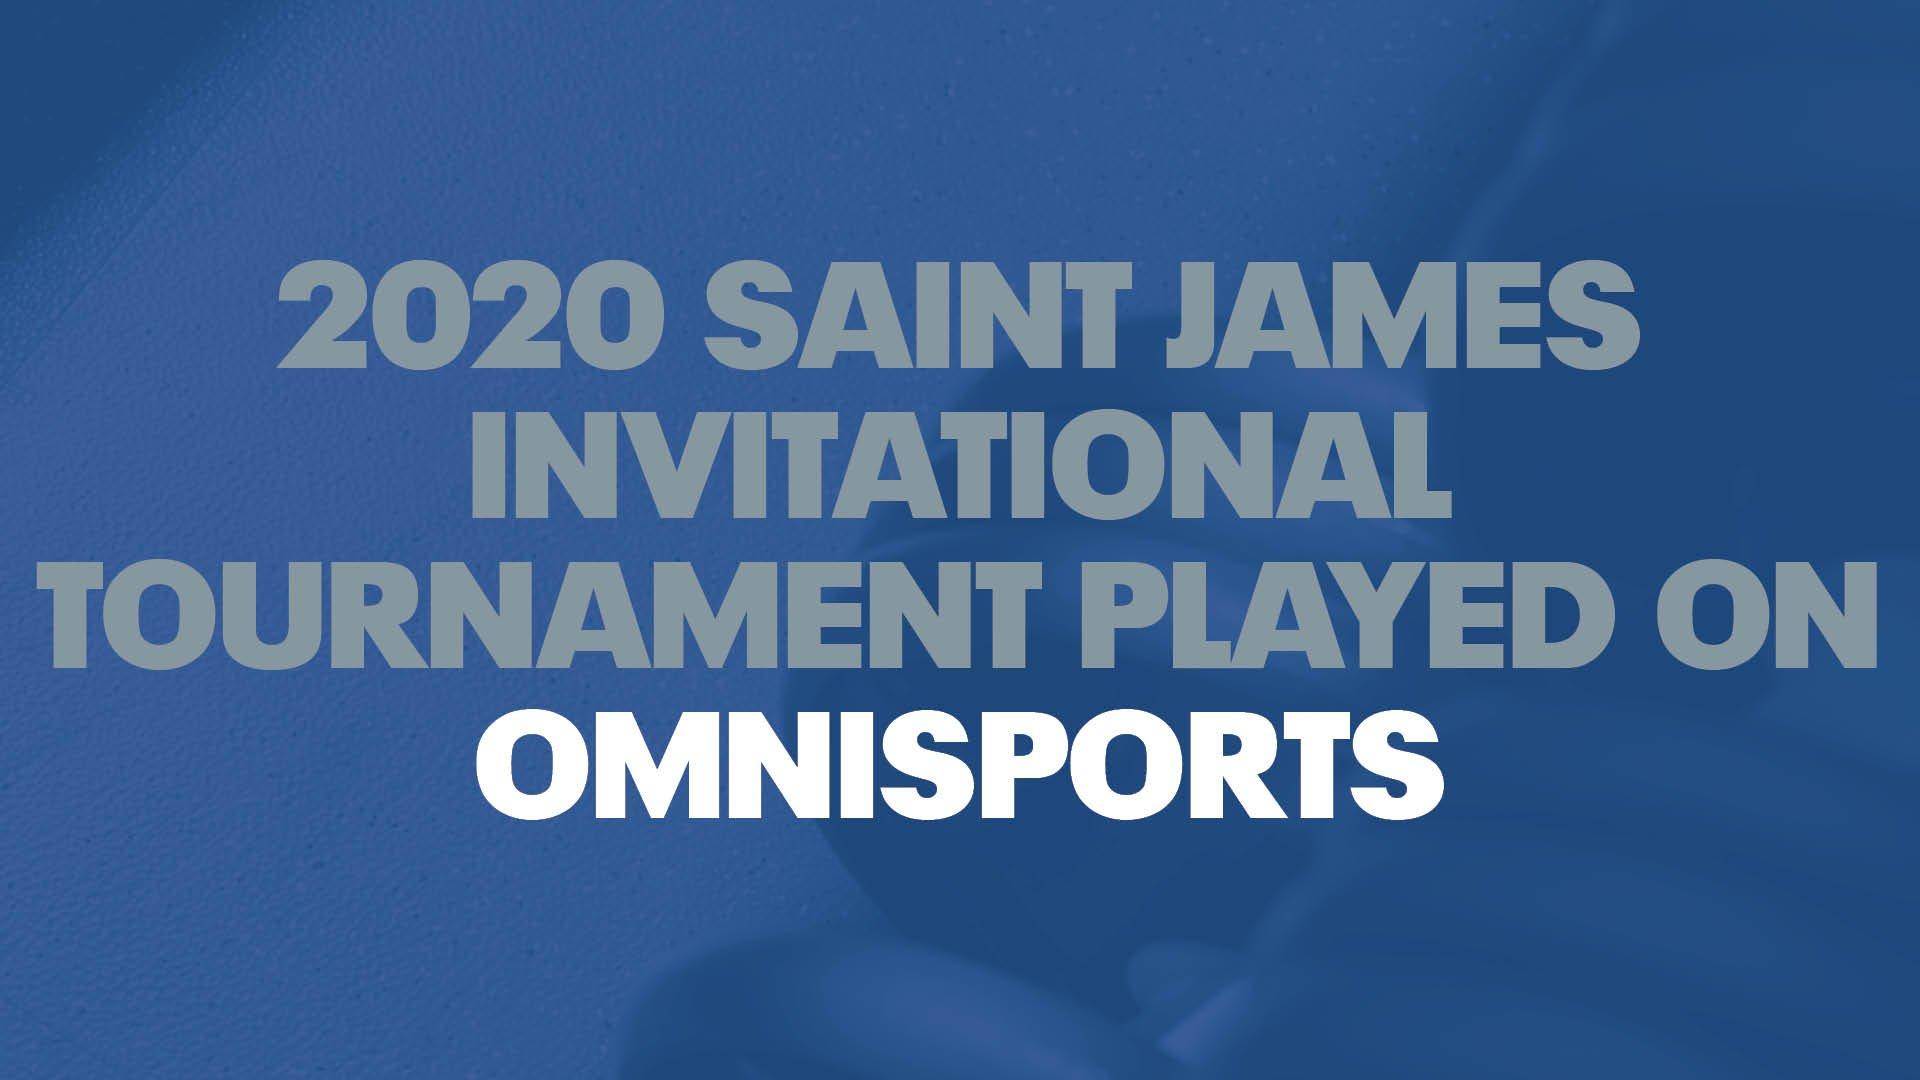 2020 SAINT JAMES INVITATIONAL TOURNAMENT PLAYED ON OMNISPORTS